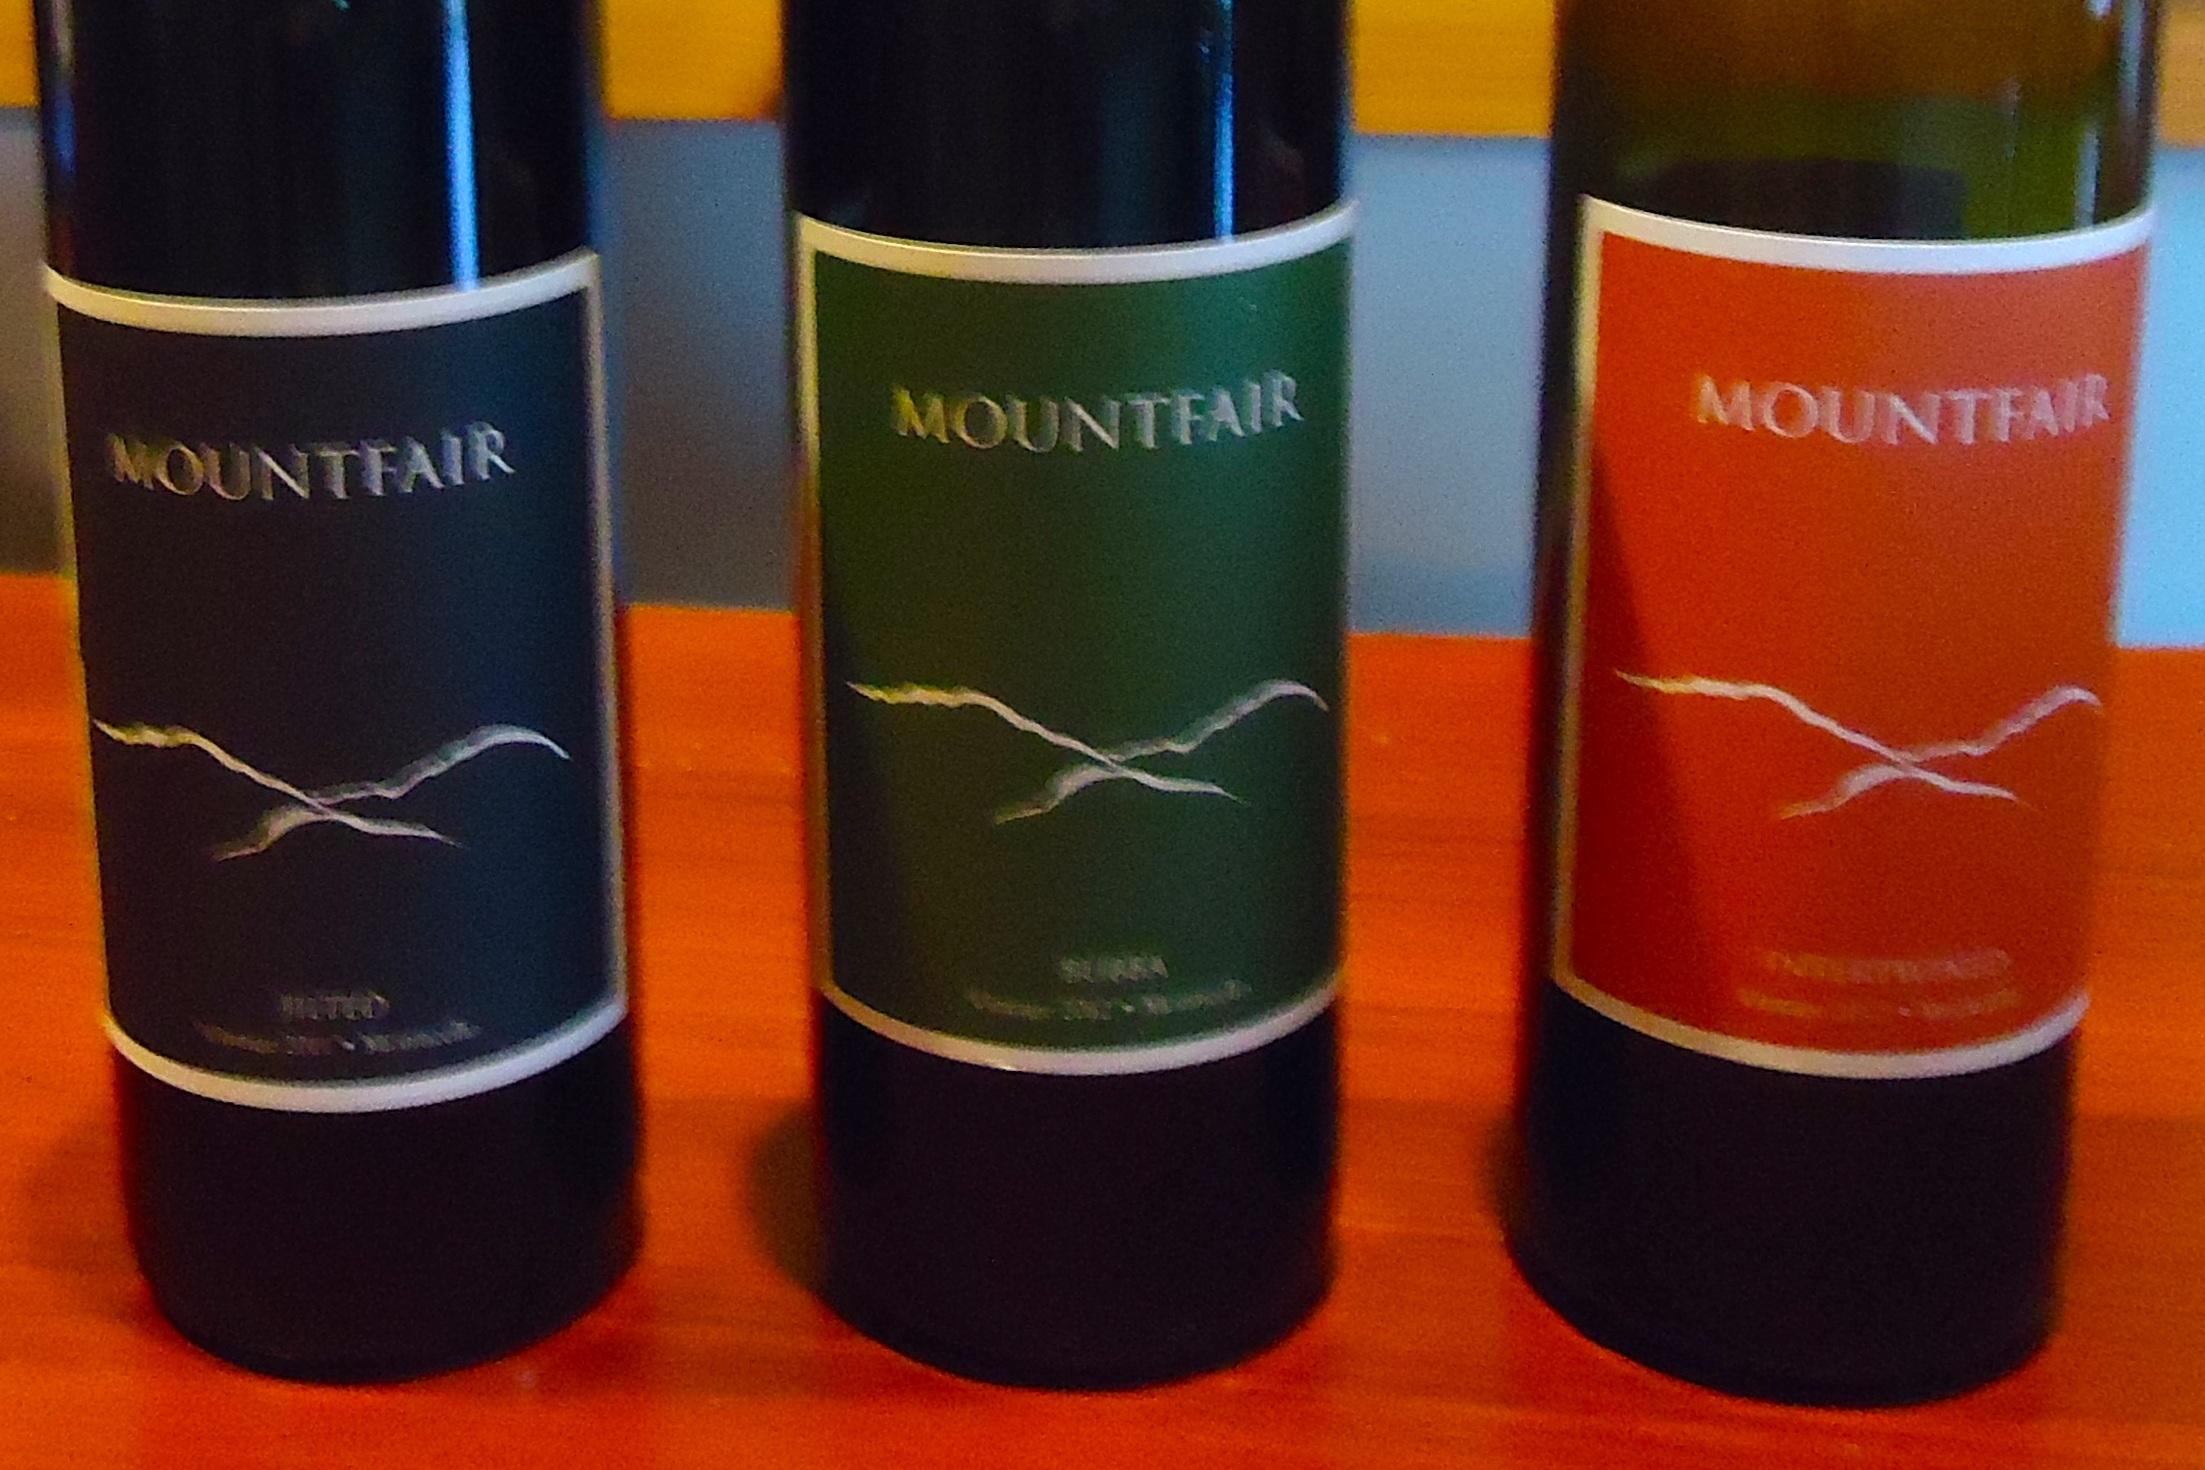 Mountfair Vineyards